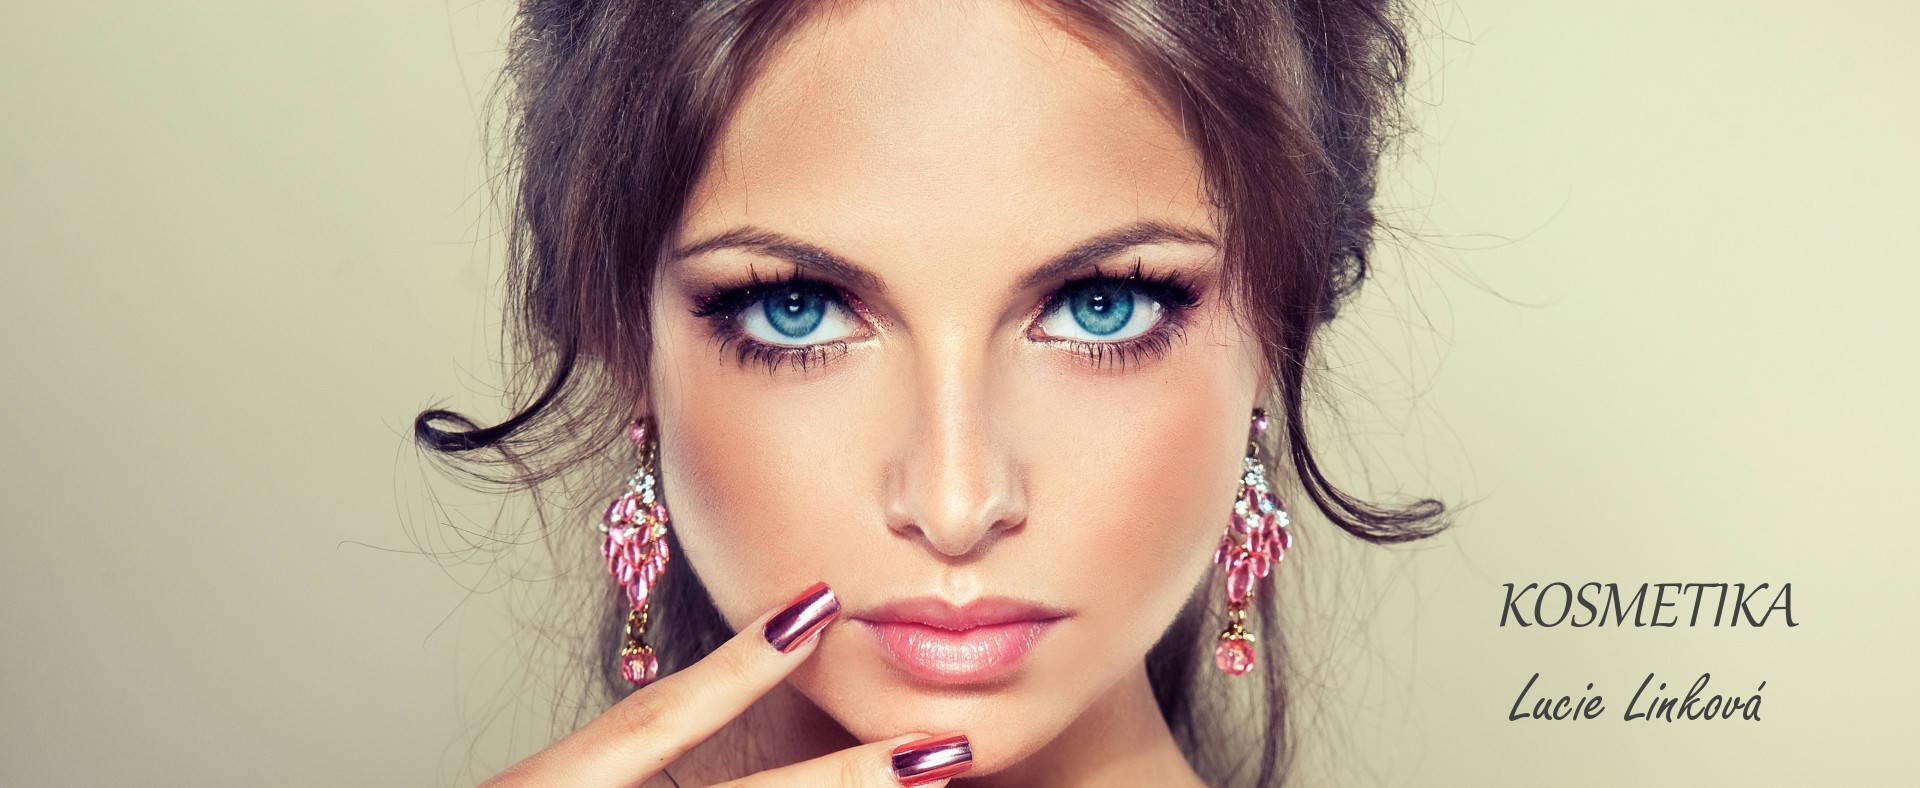 Kosmetika Pardubice